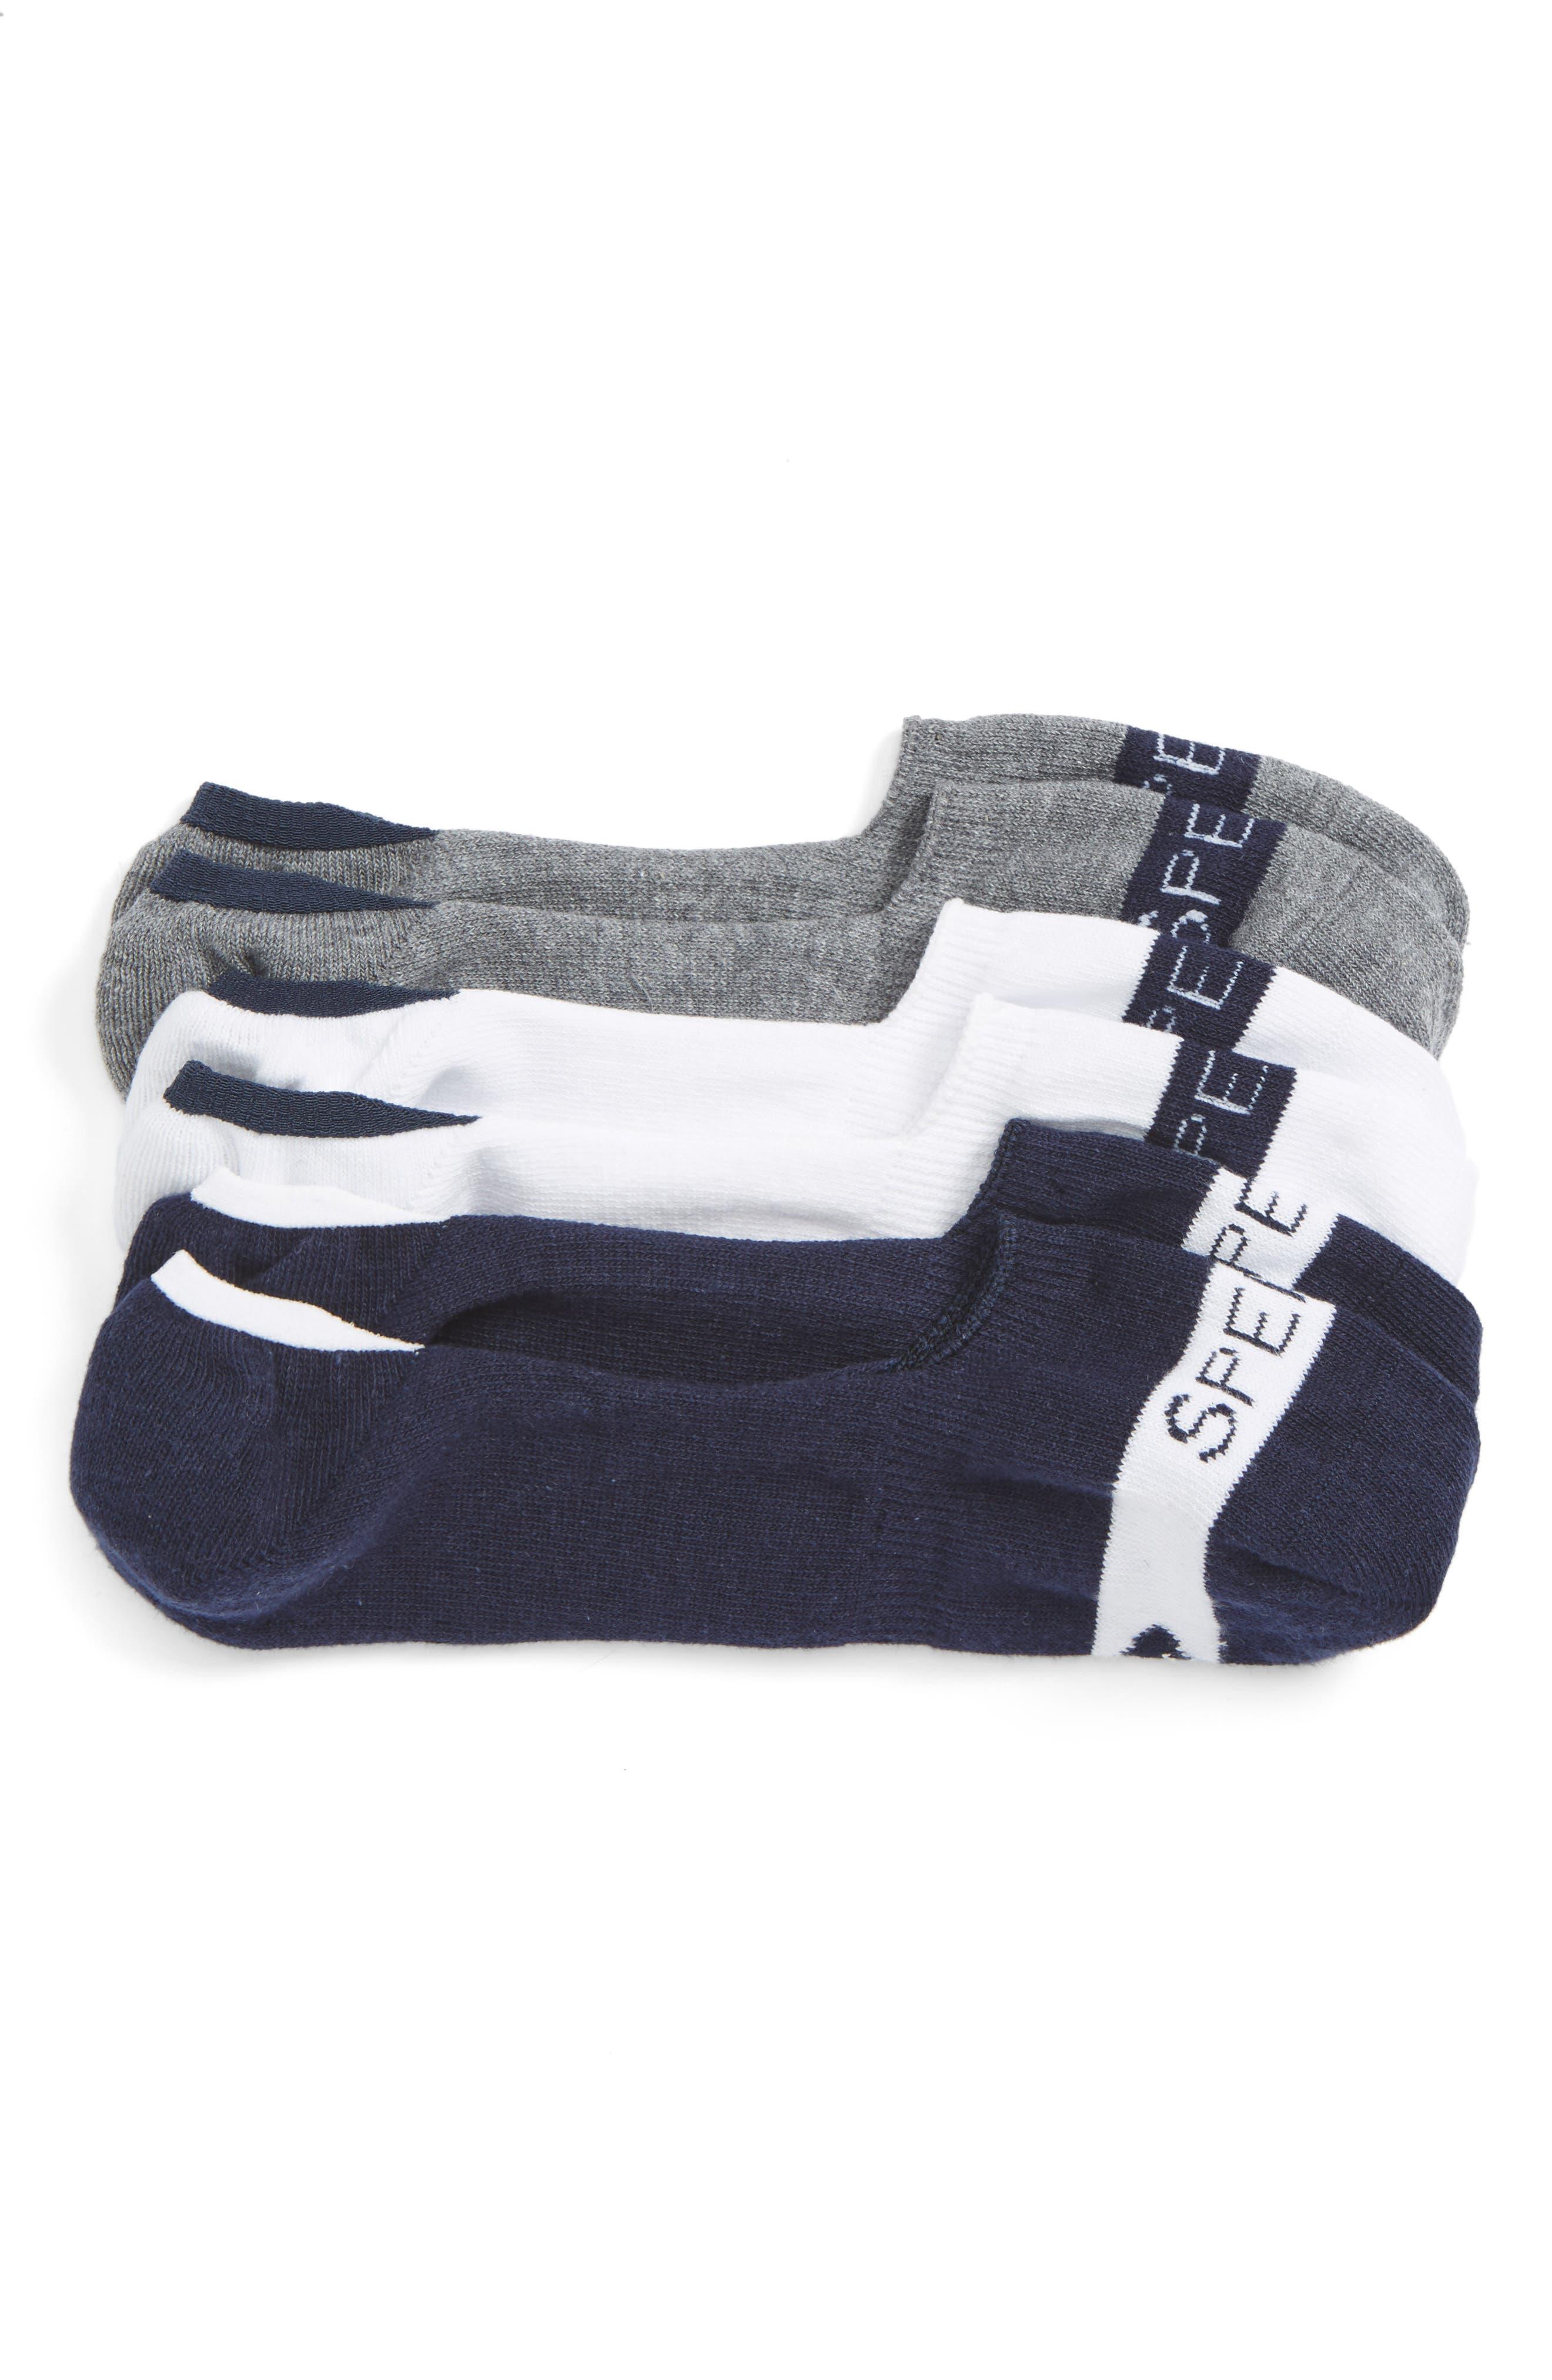 Sperry Signature Assorted 3-Pack No-Show Socks